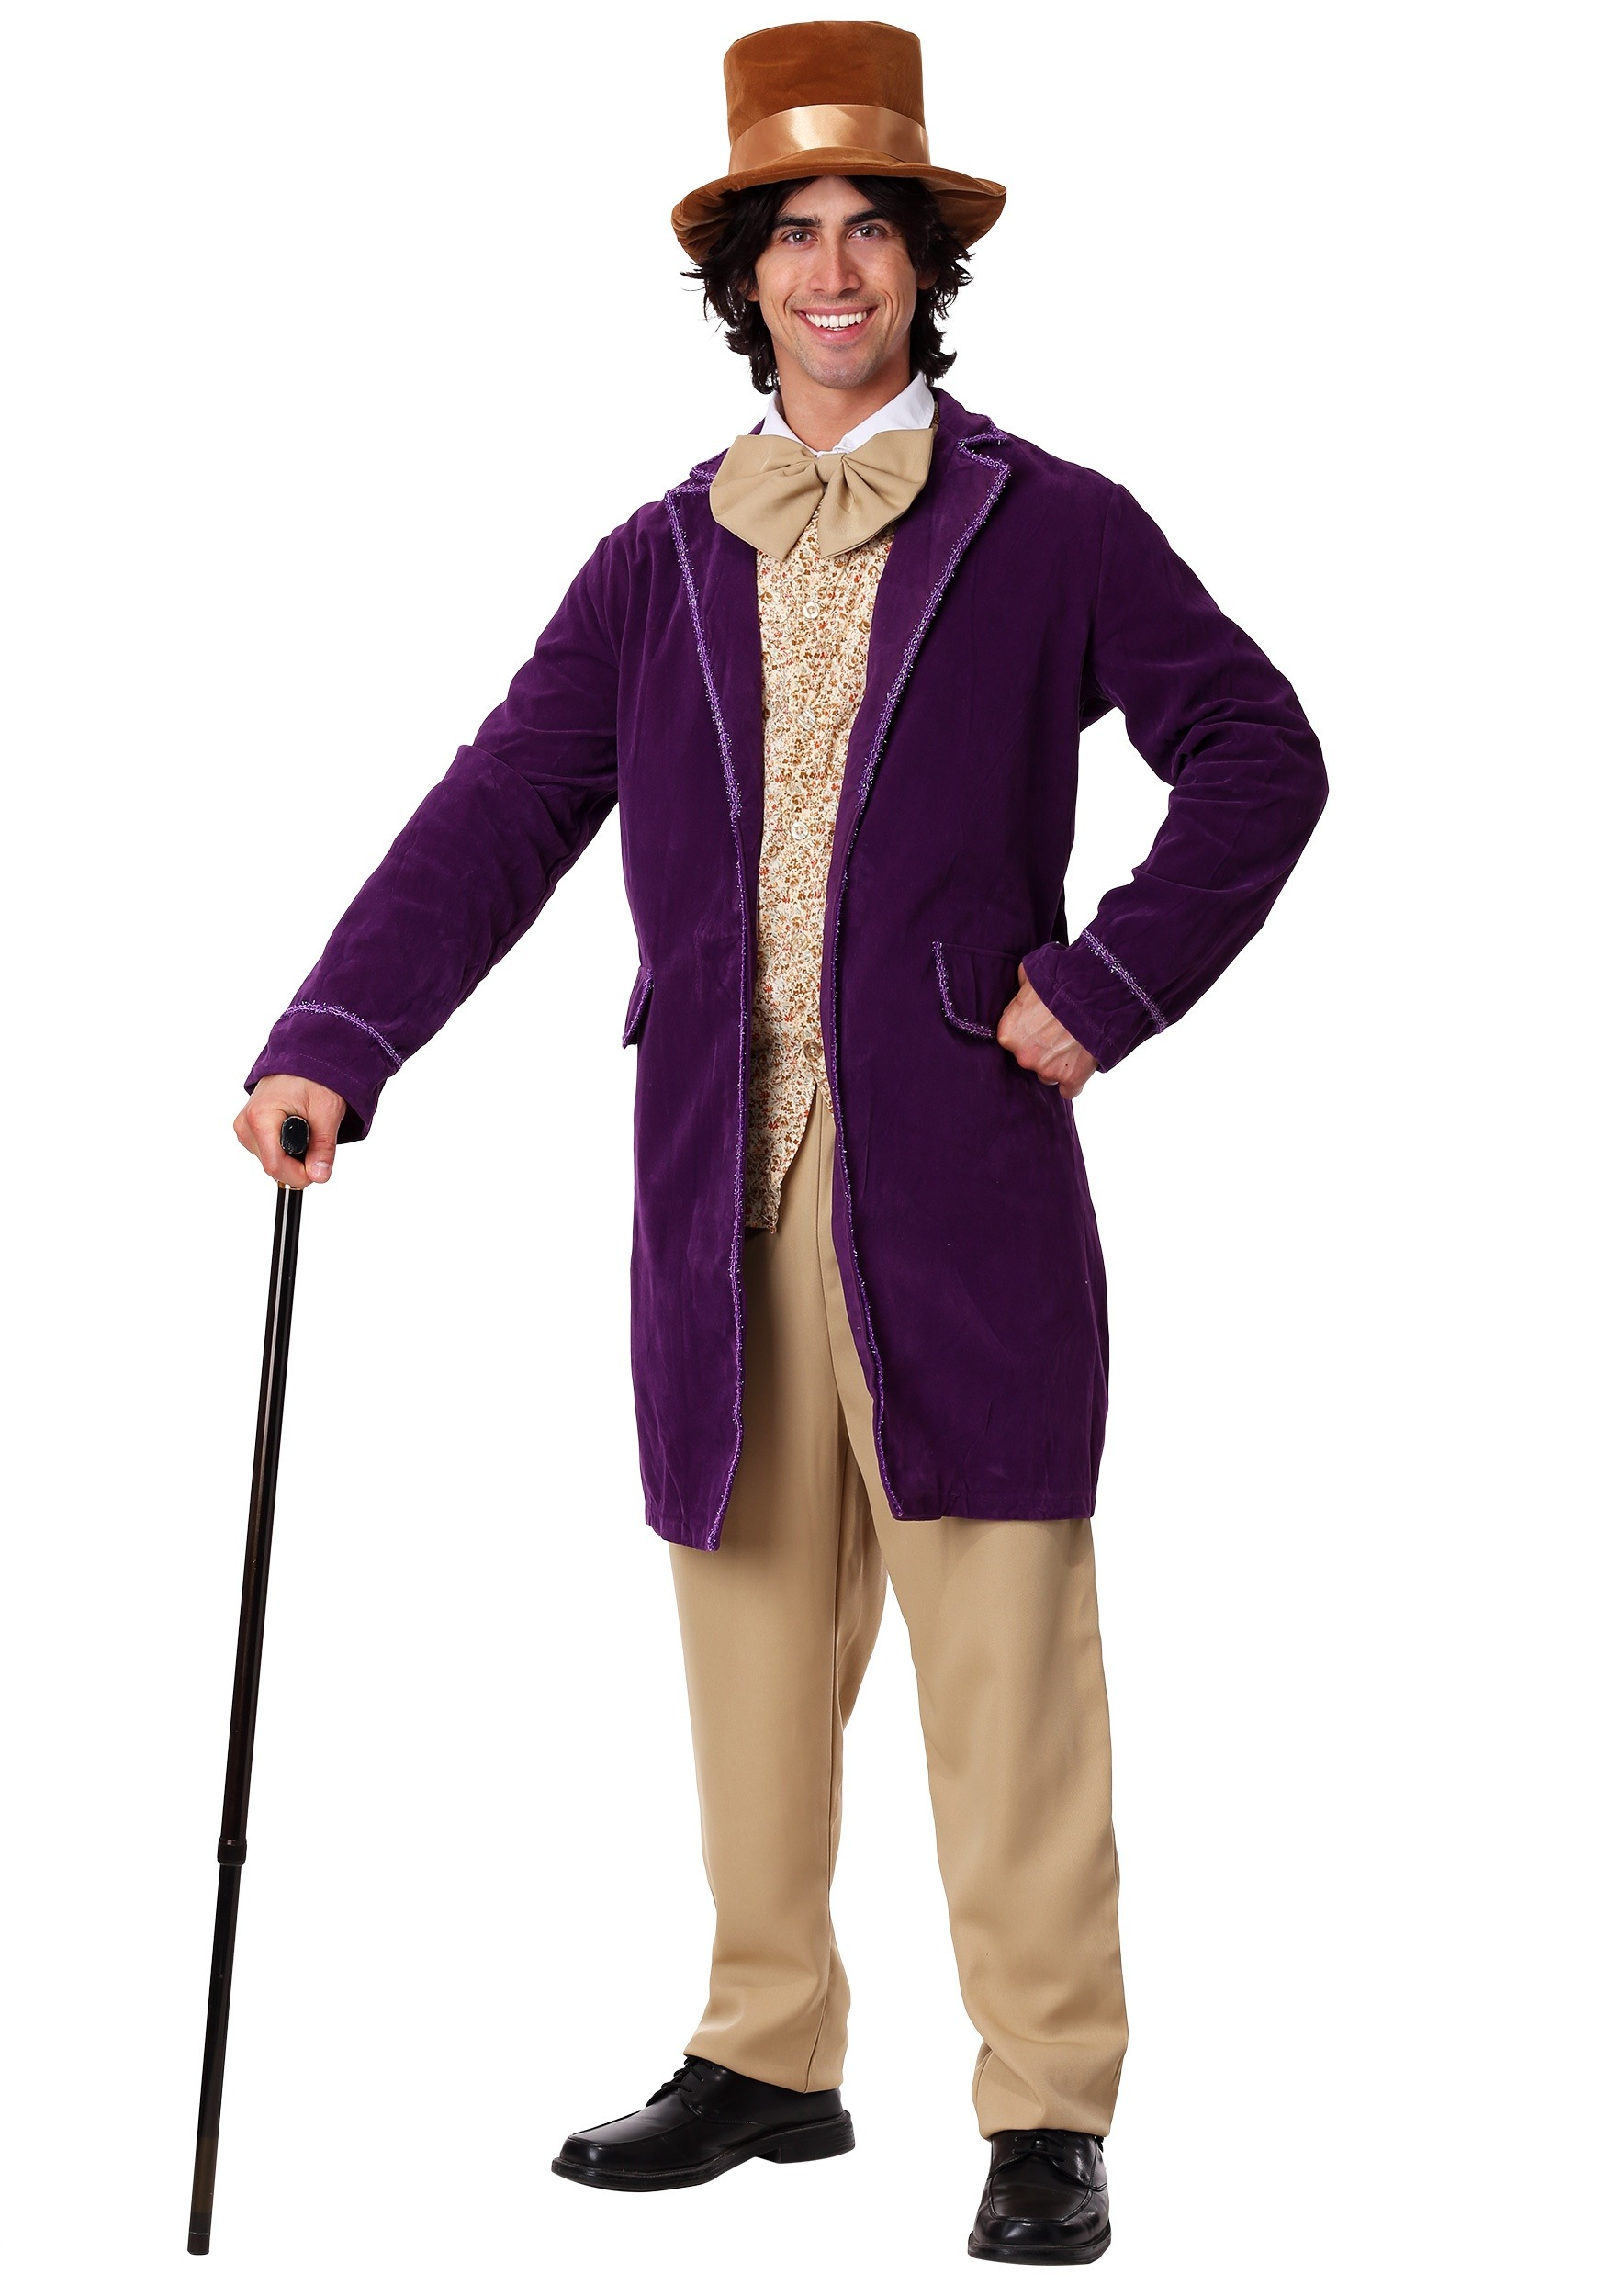 plus size mens halloween costumes plus size willy wonka costume plus size mens halloween costumes